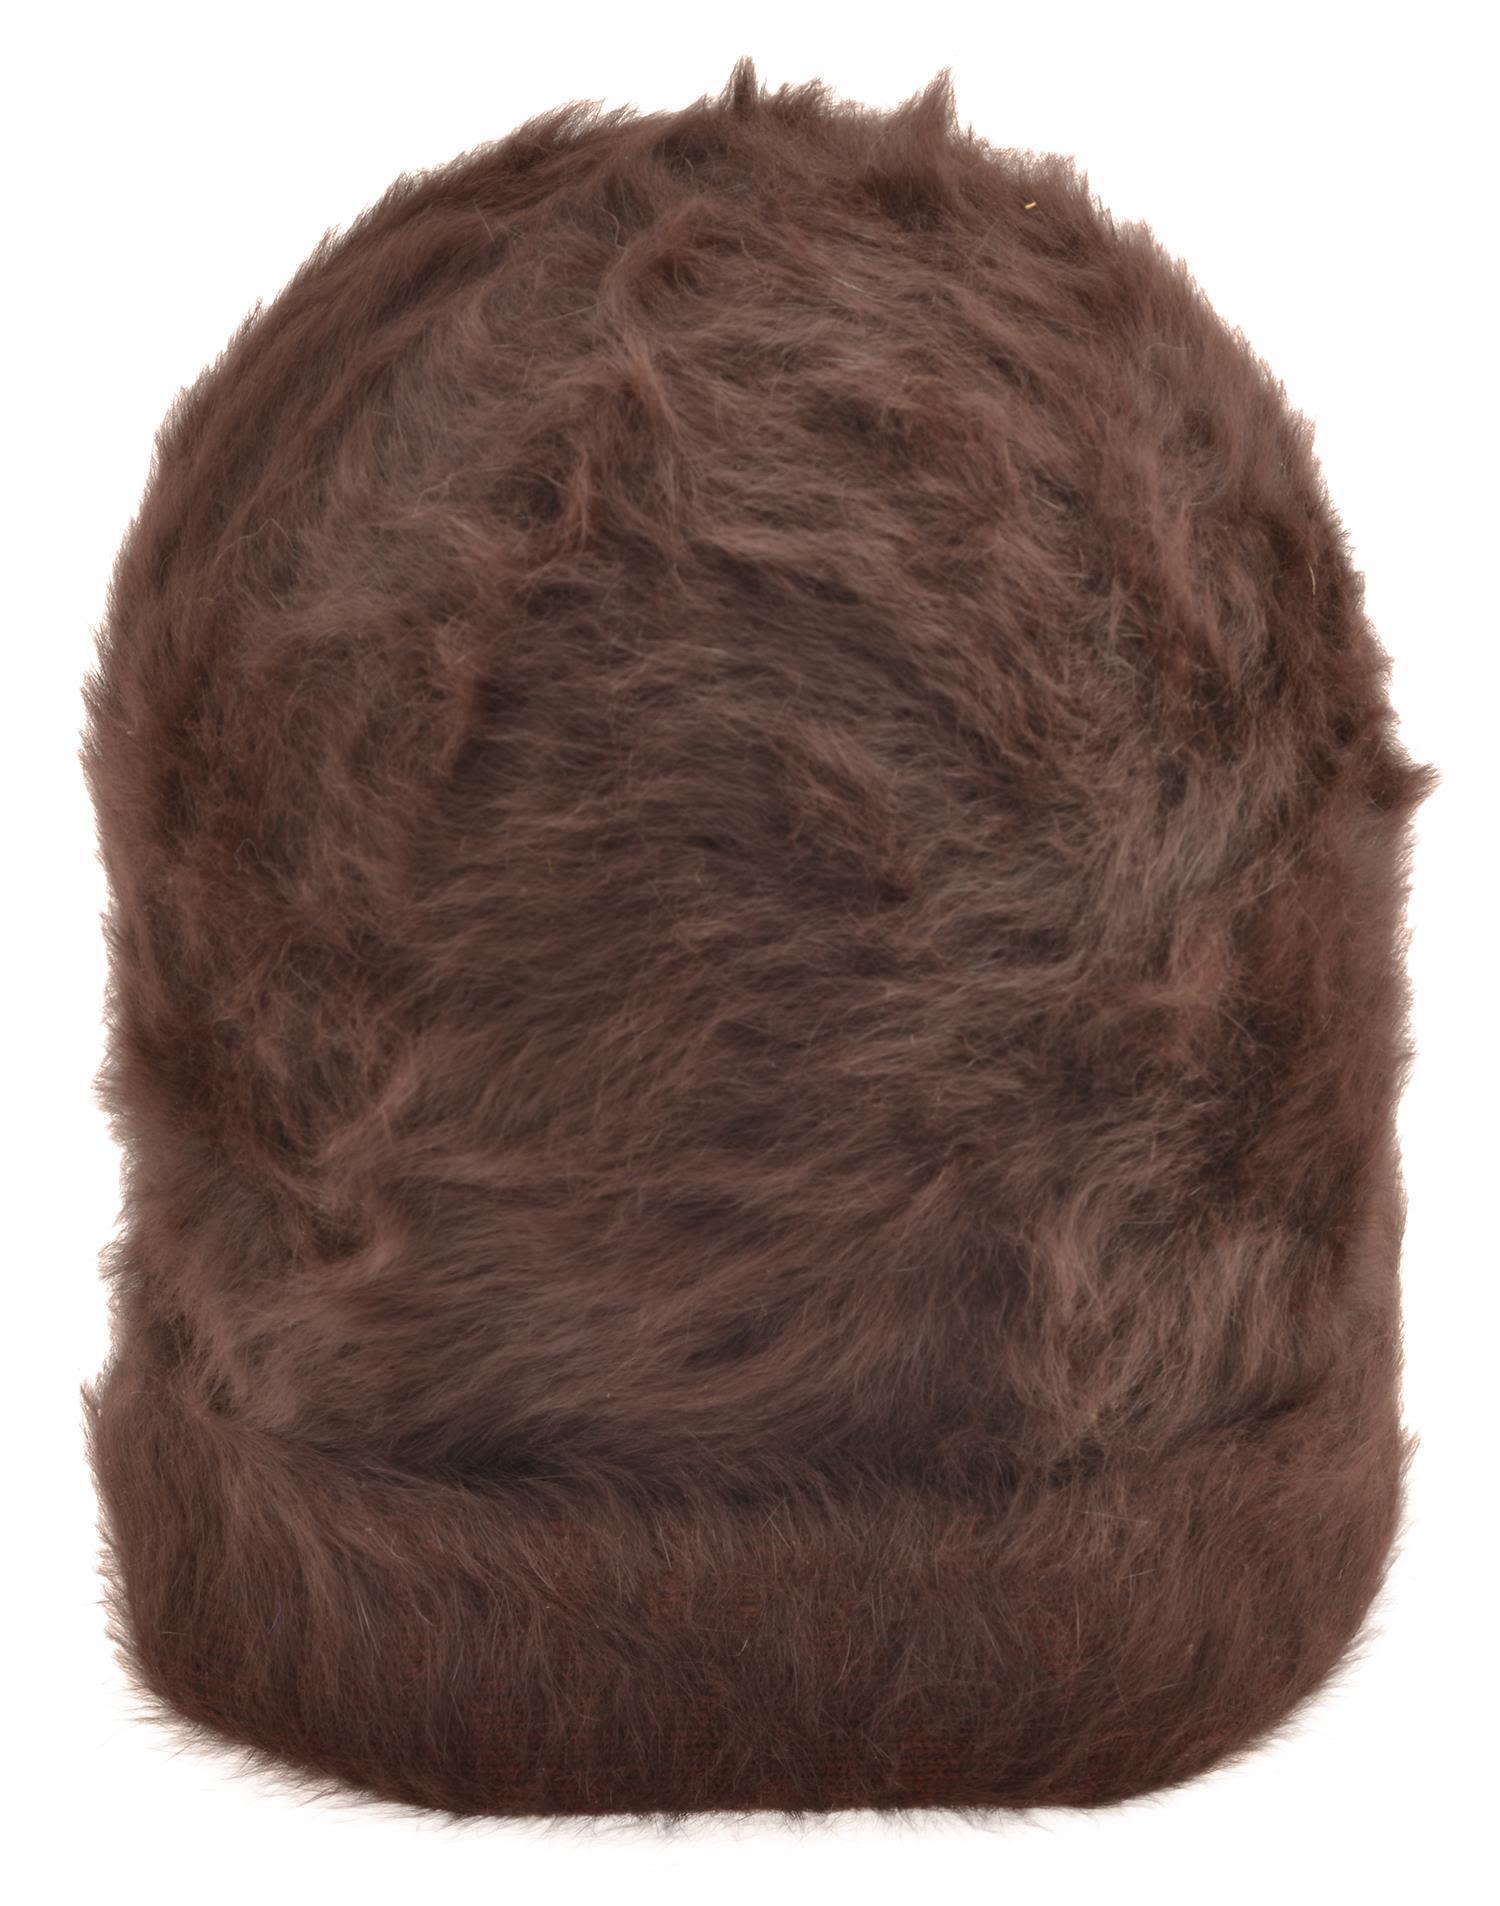 Reinhard Plank Lapin Hat In Brown